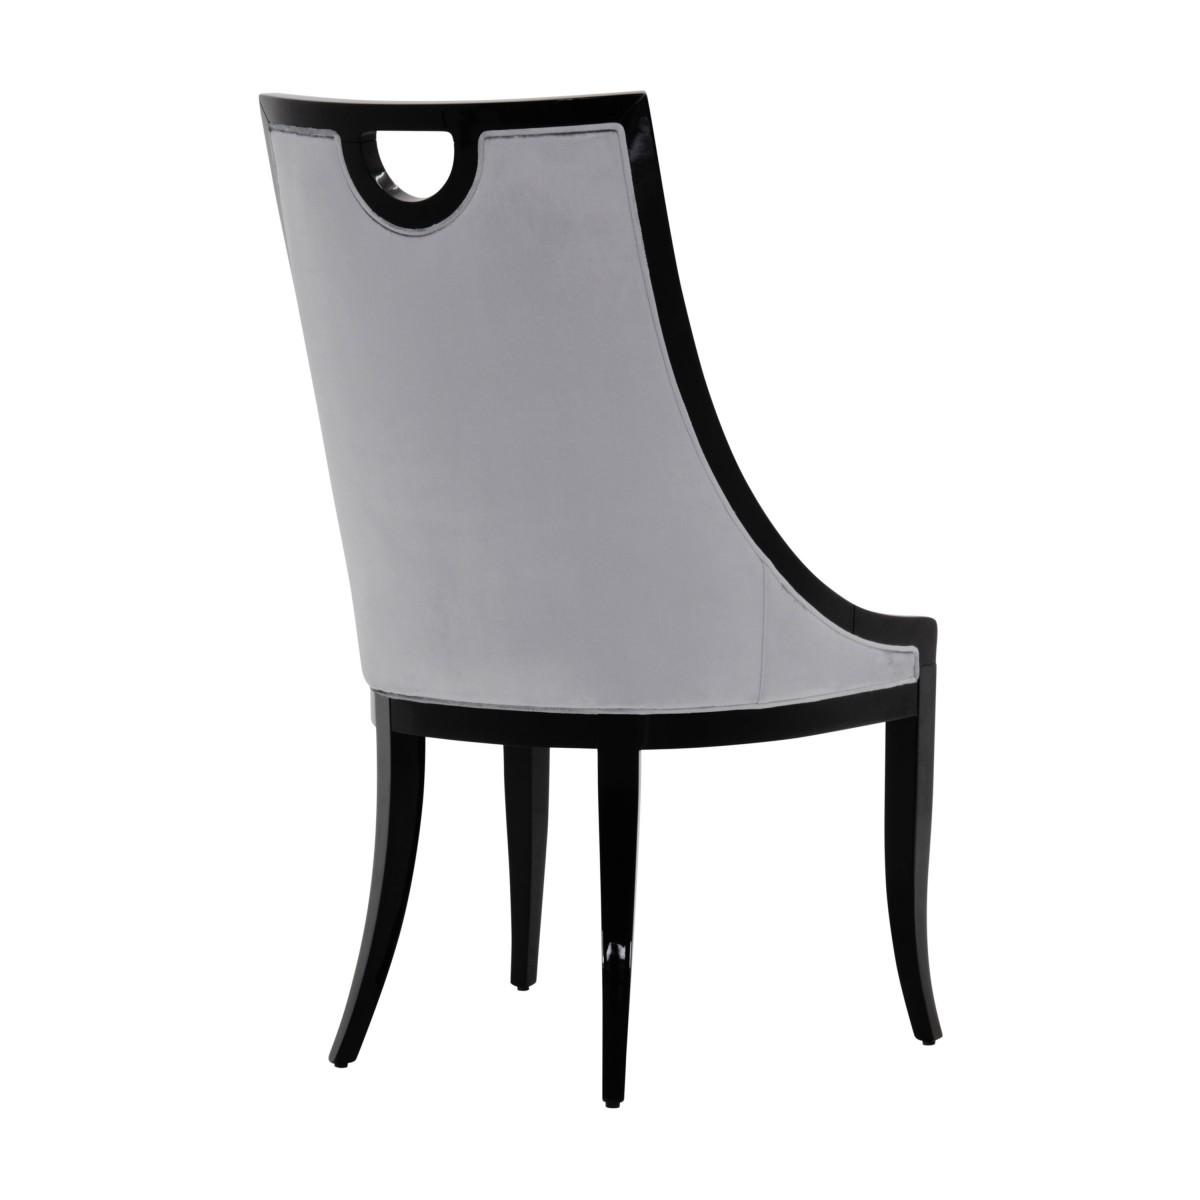 italian chair astra 2 3015